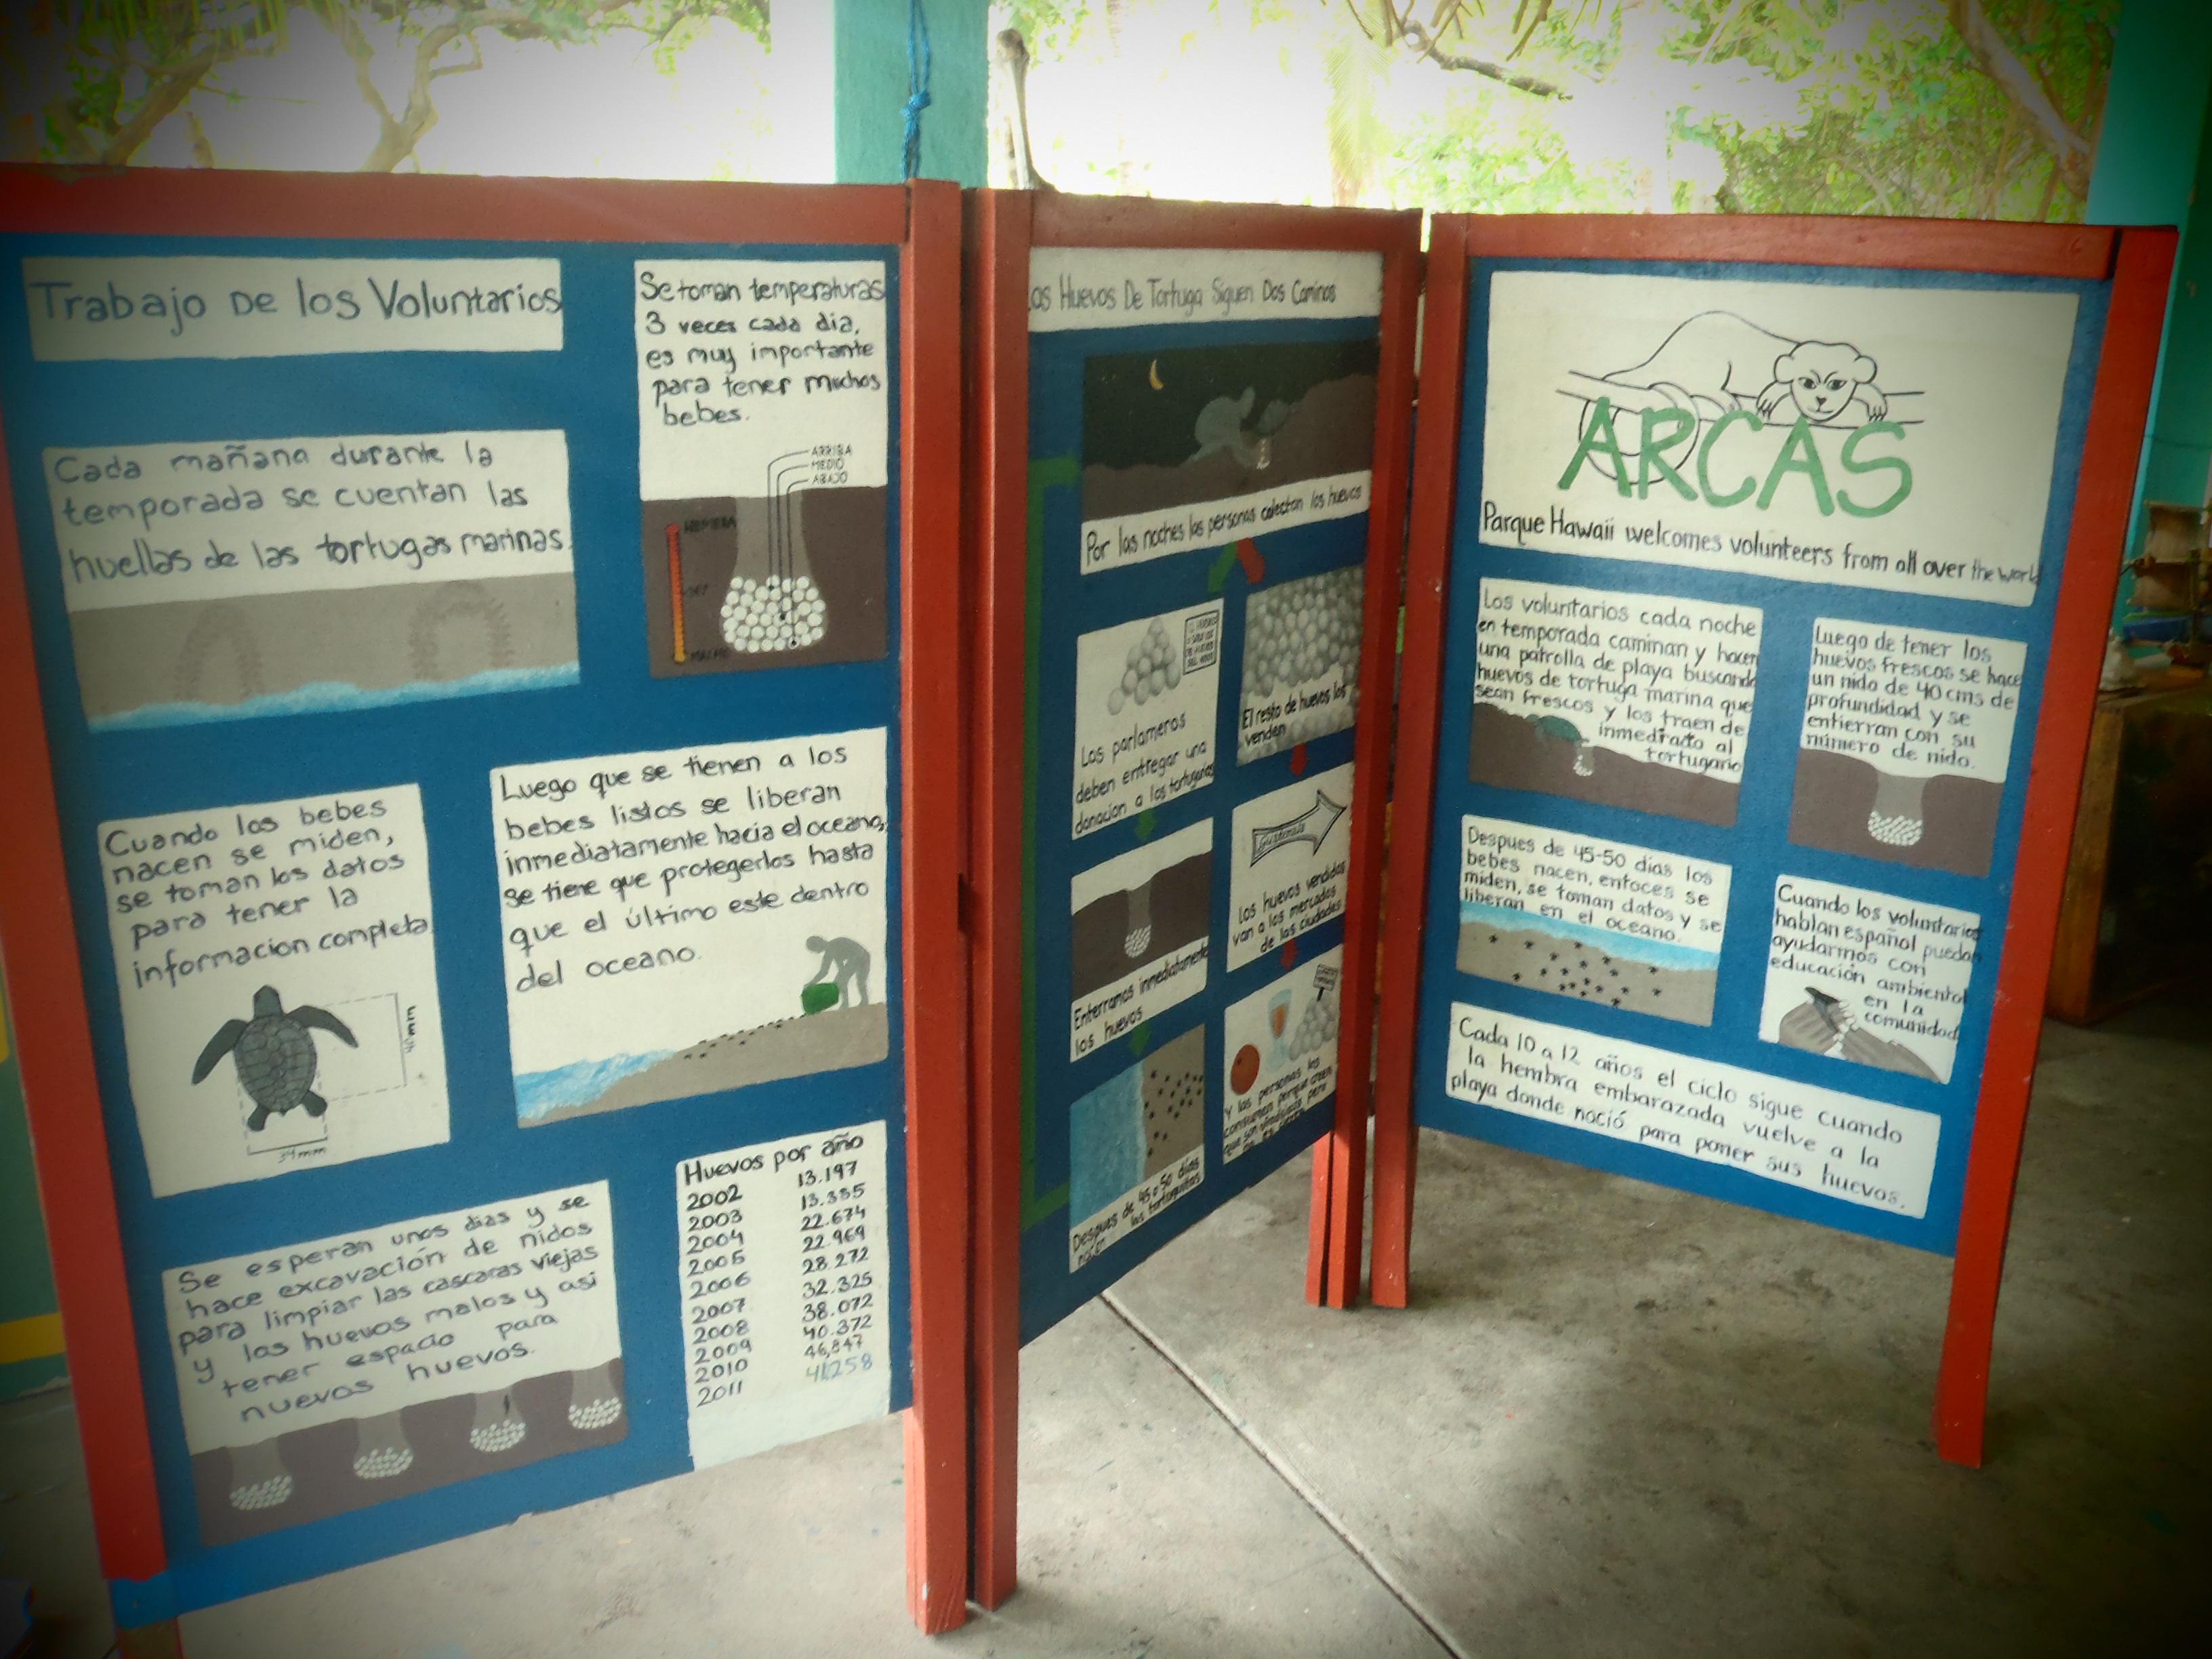 ARCAS Background; Montericco, Guatemala; 2013